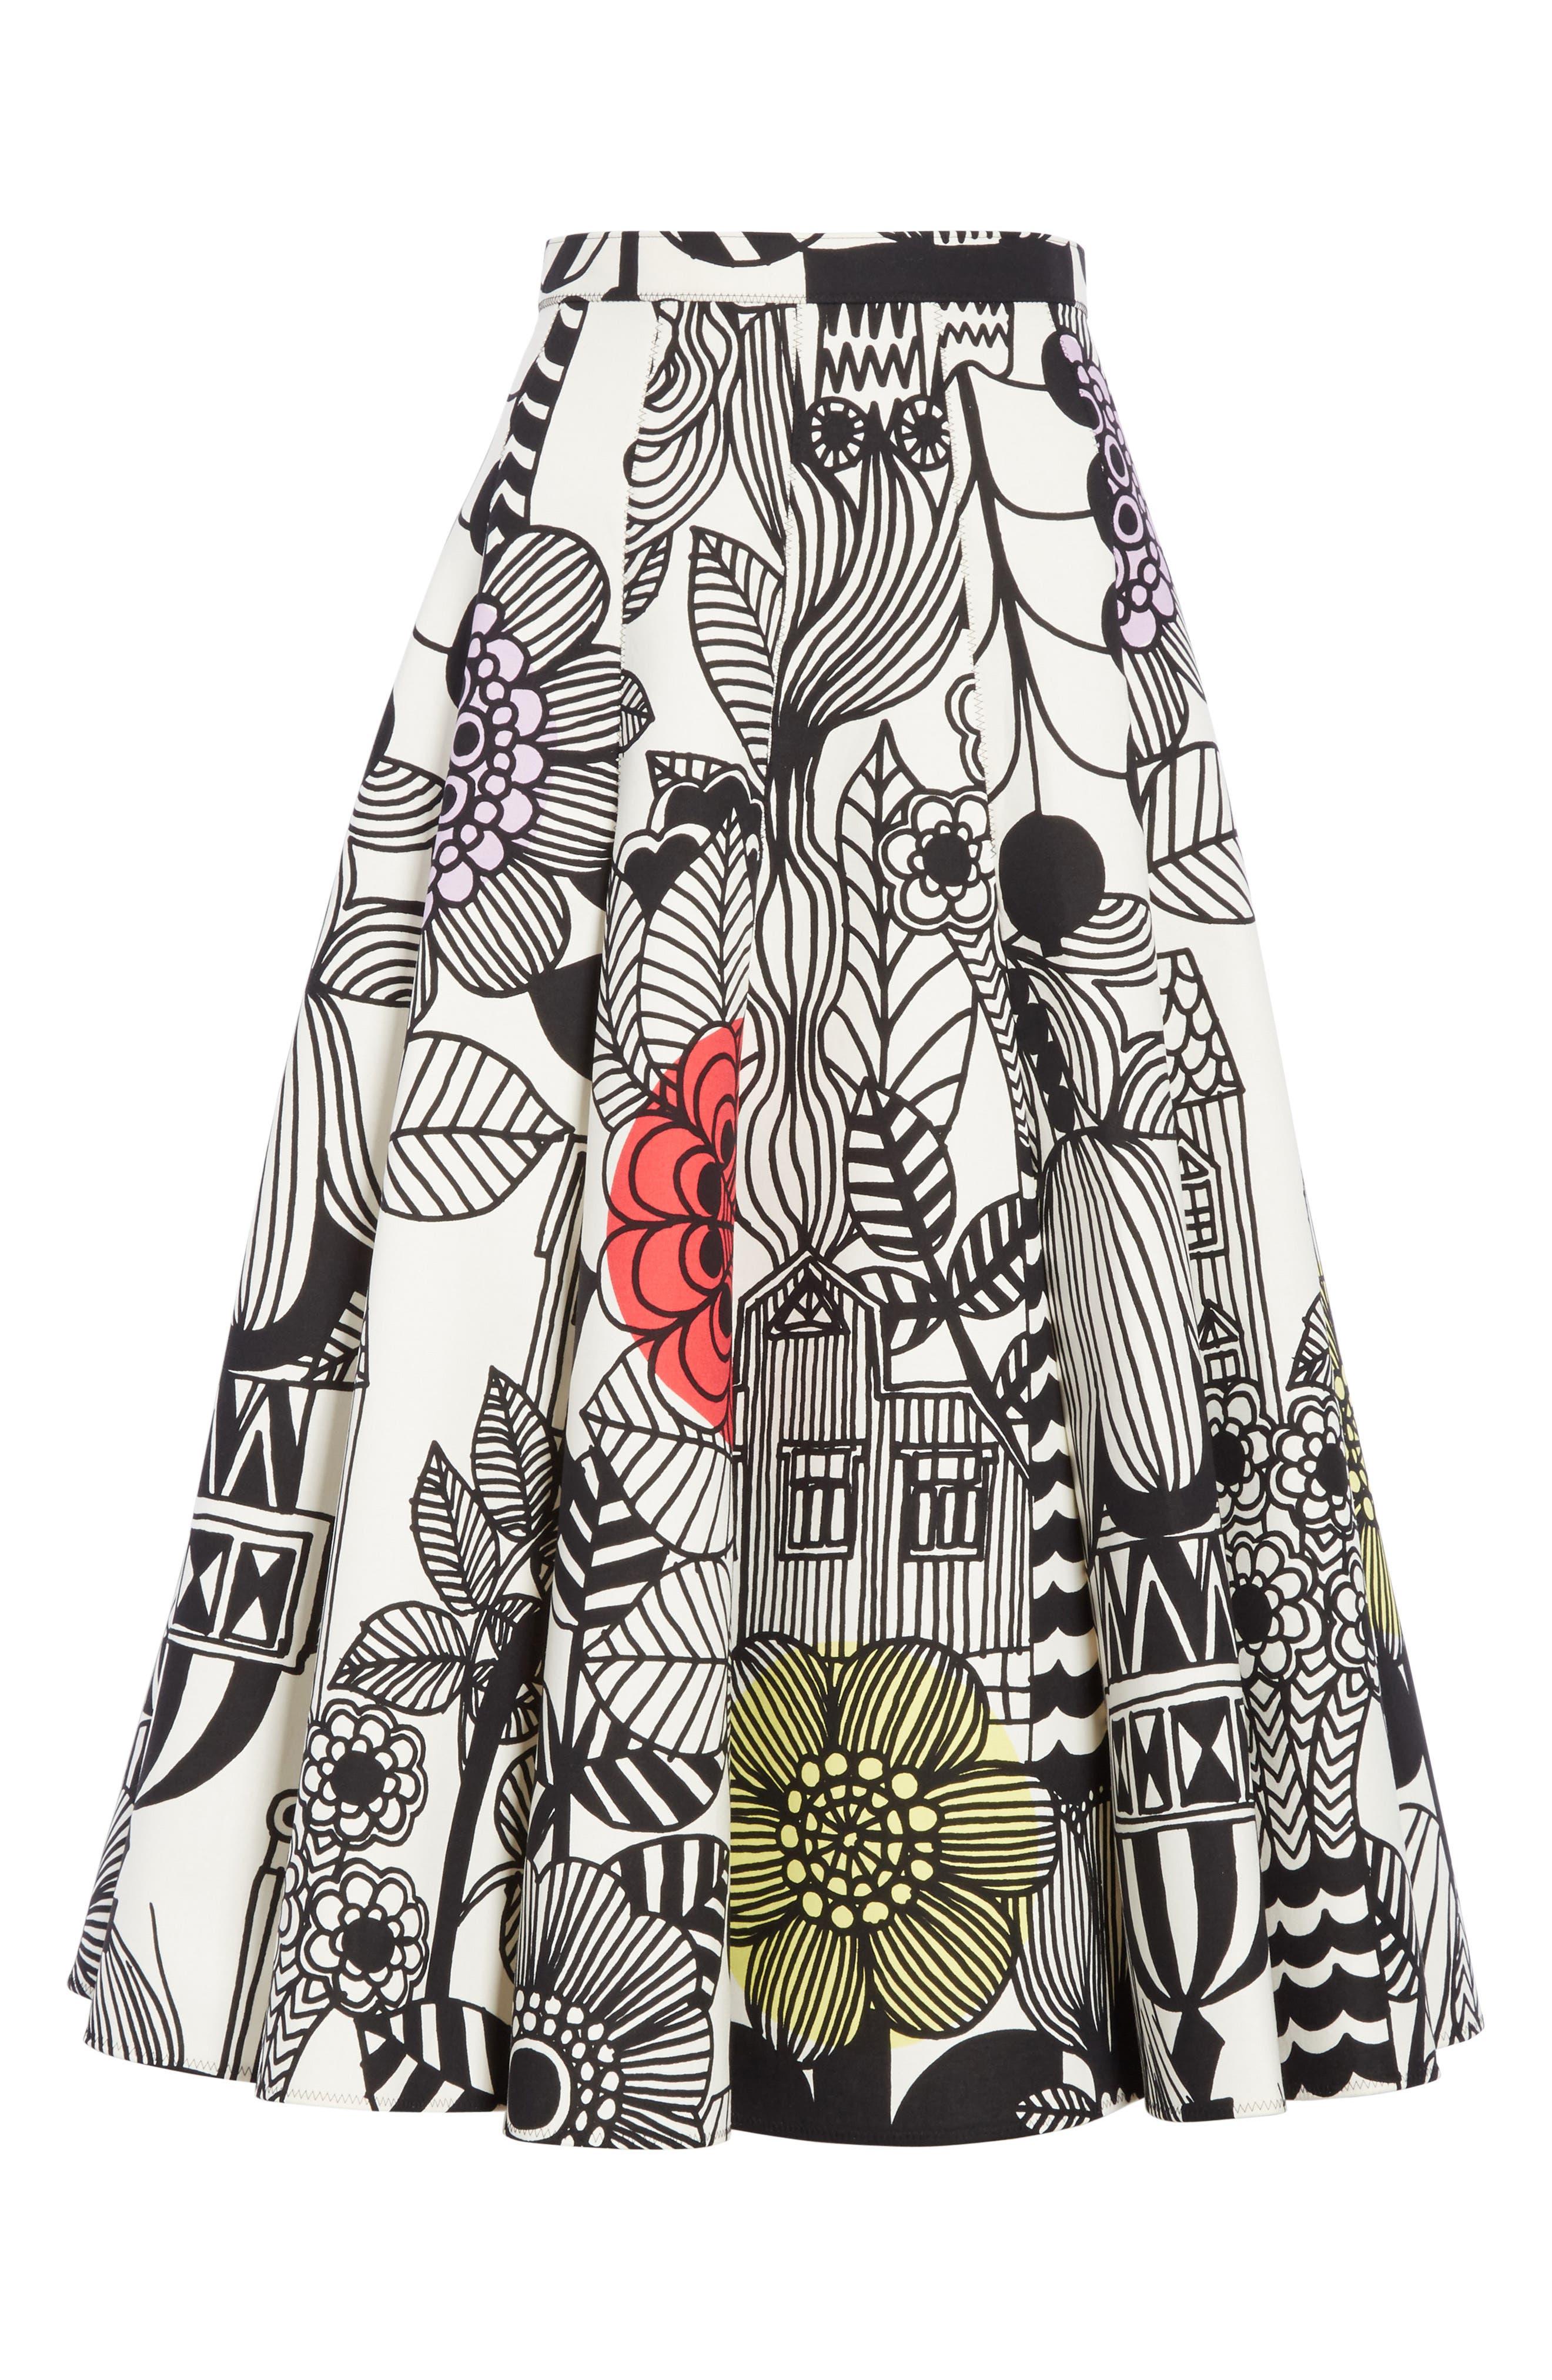 x Marimekko Vegetable Print Cotton Skirt,                             Alternate thumbnail 6, color,                             Wht/ Blk/ Ylw